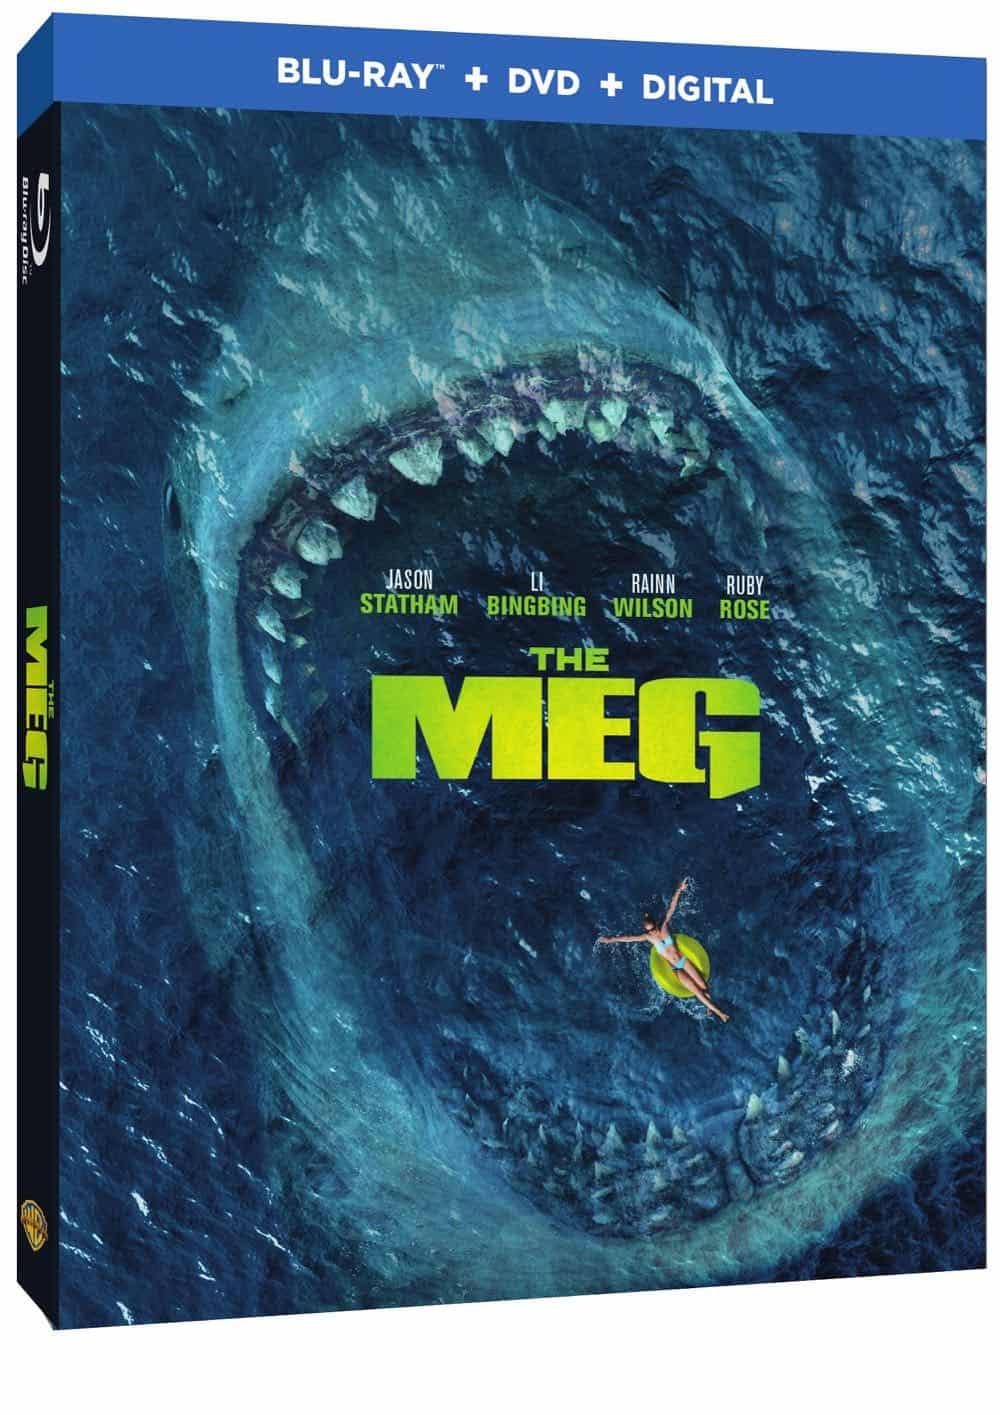 The Meg Bluray DVD Digital 2